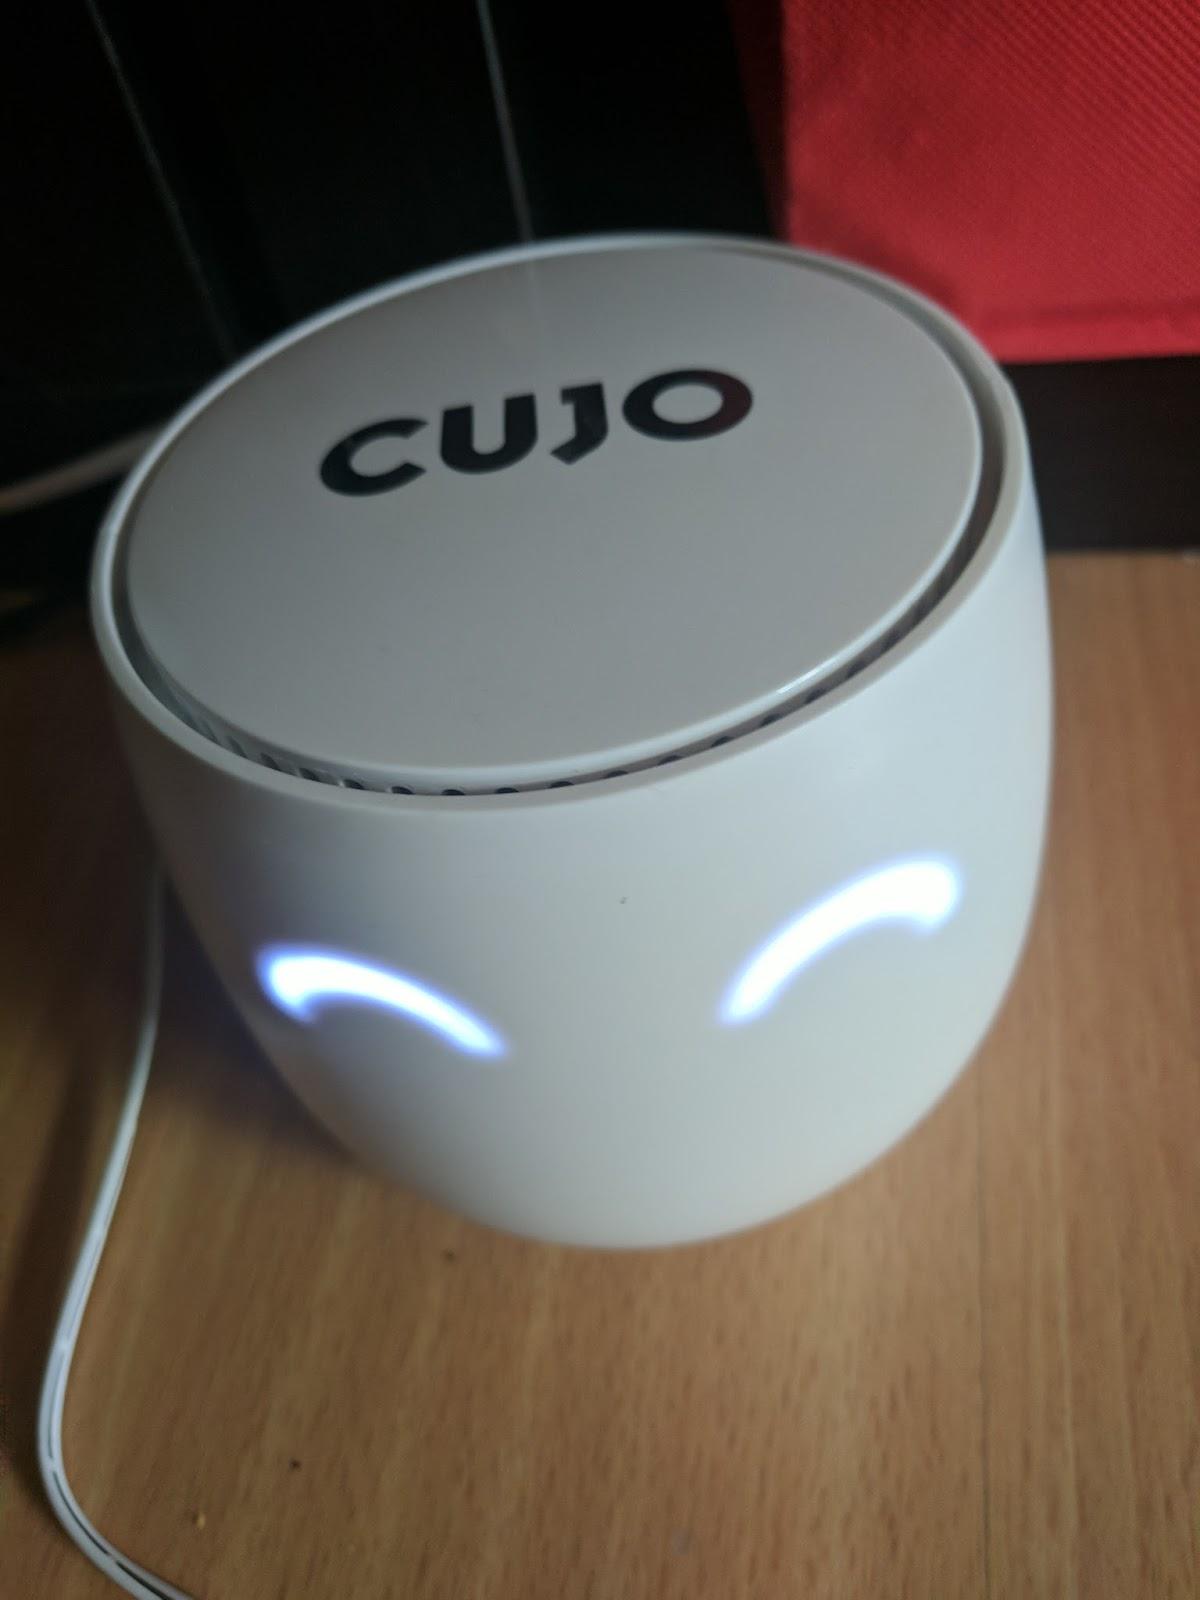 Gypsy Soul Life: Thanks to #CUJO Smart Firewall and #Bestbuy